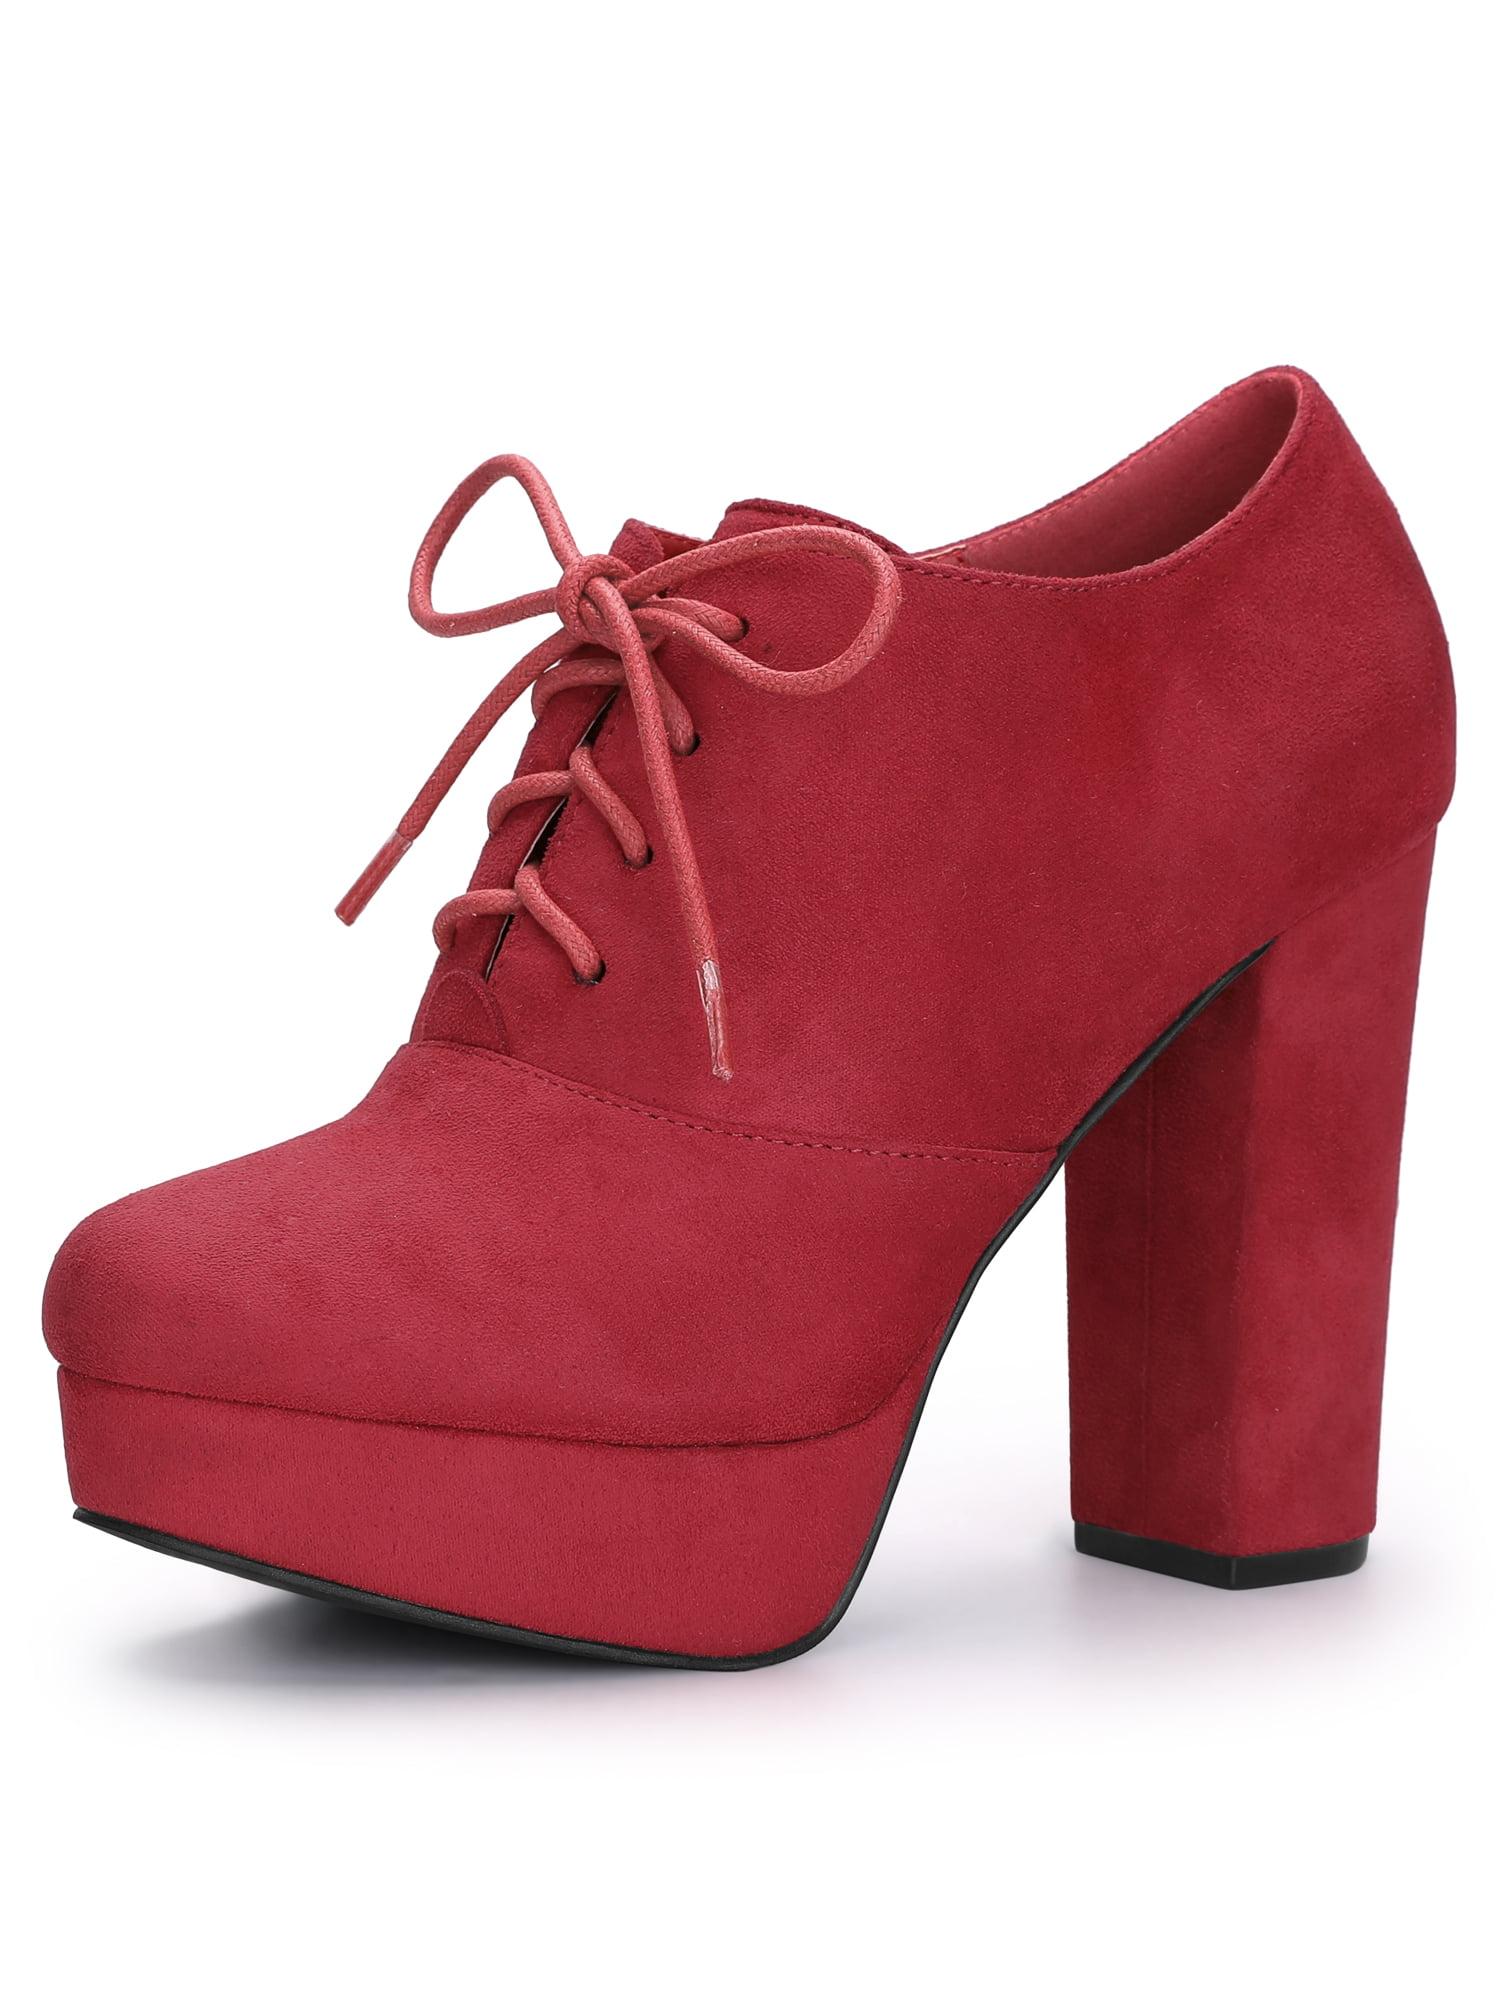 Women's Platform Block Heel Lace Up Ankle Boots Black (Size 6)